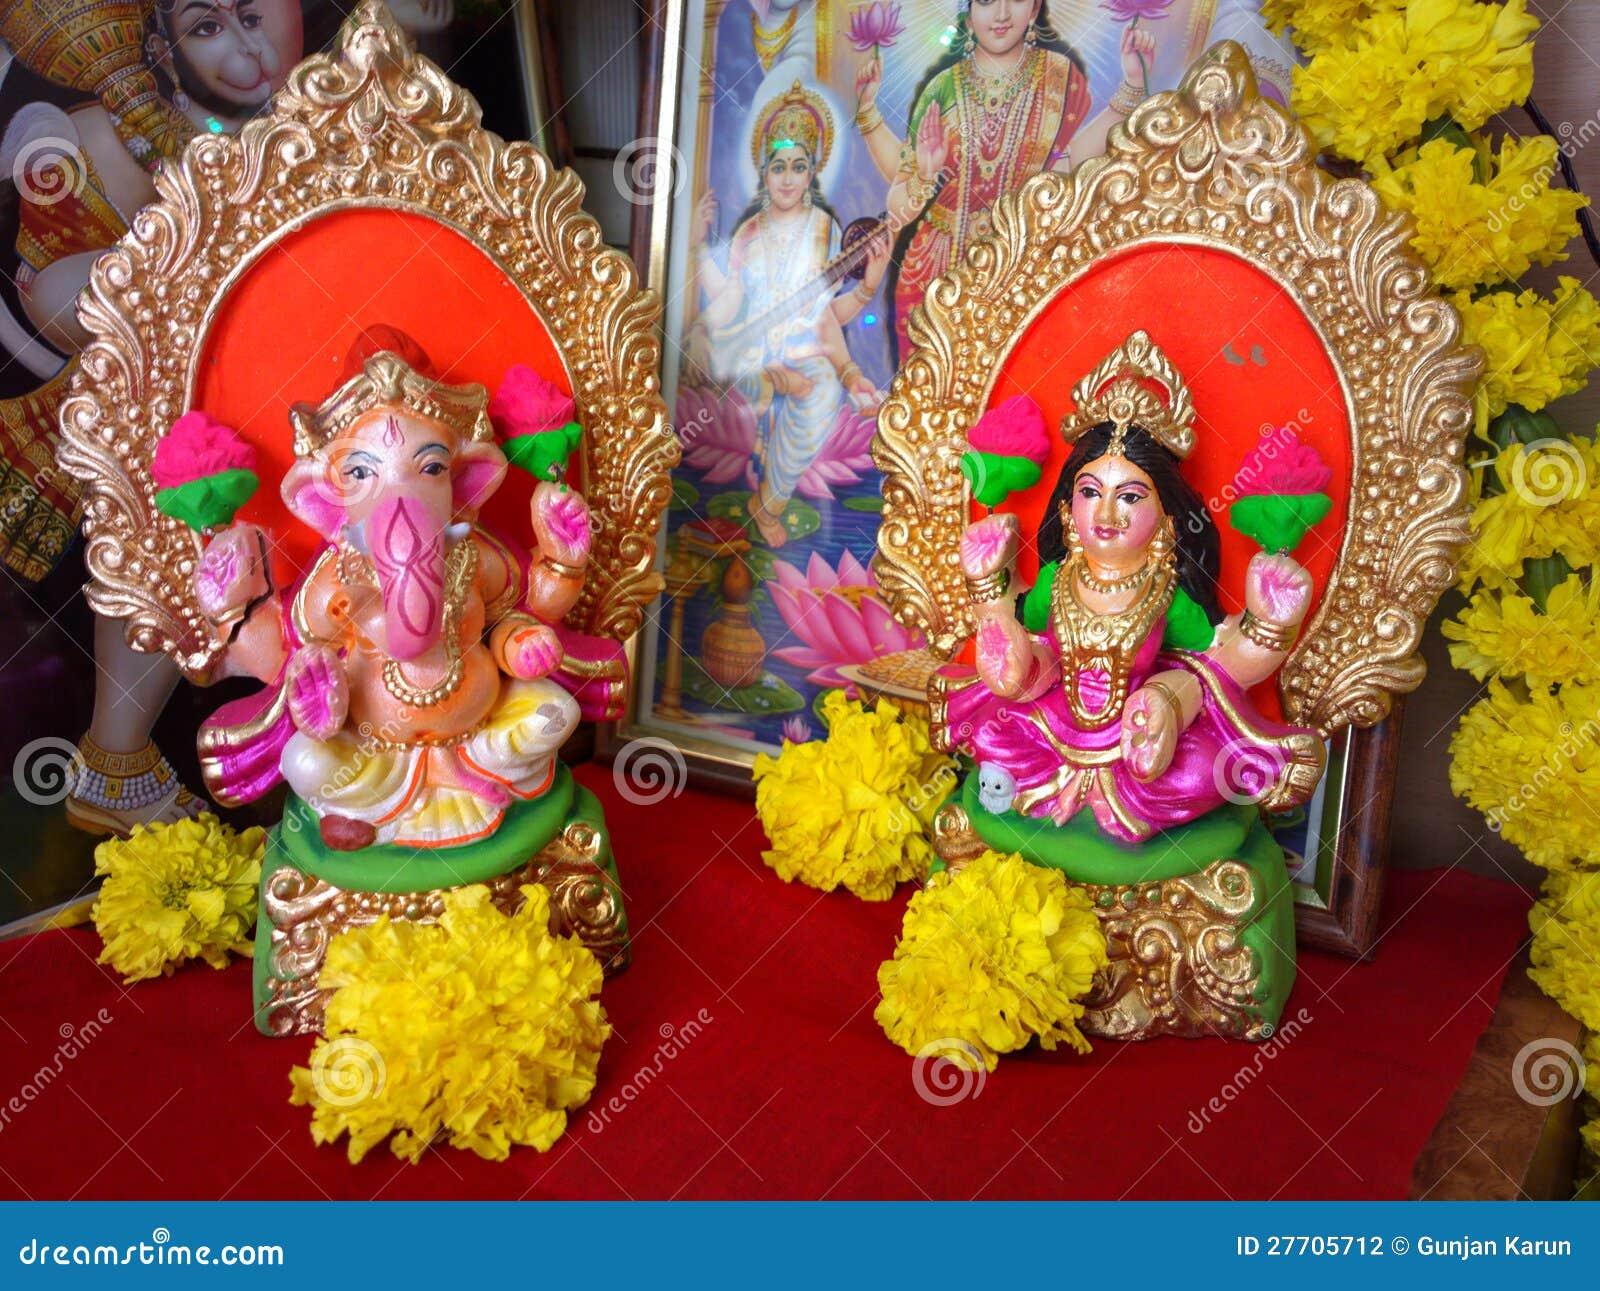 568 Laxmi Ganesh Photos Free Royalty Free Stock Photos From Dreamstime